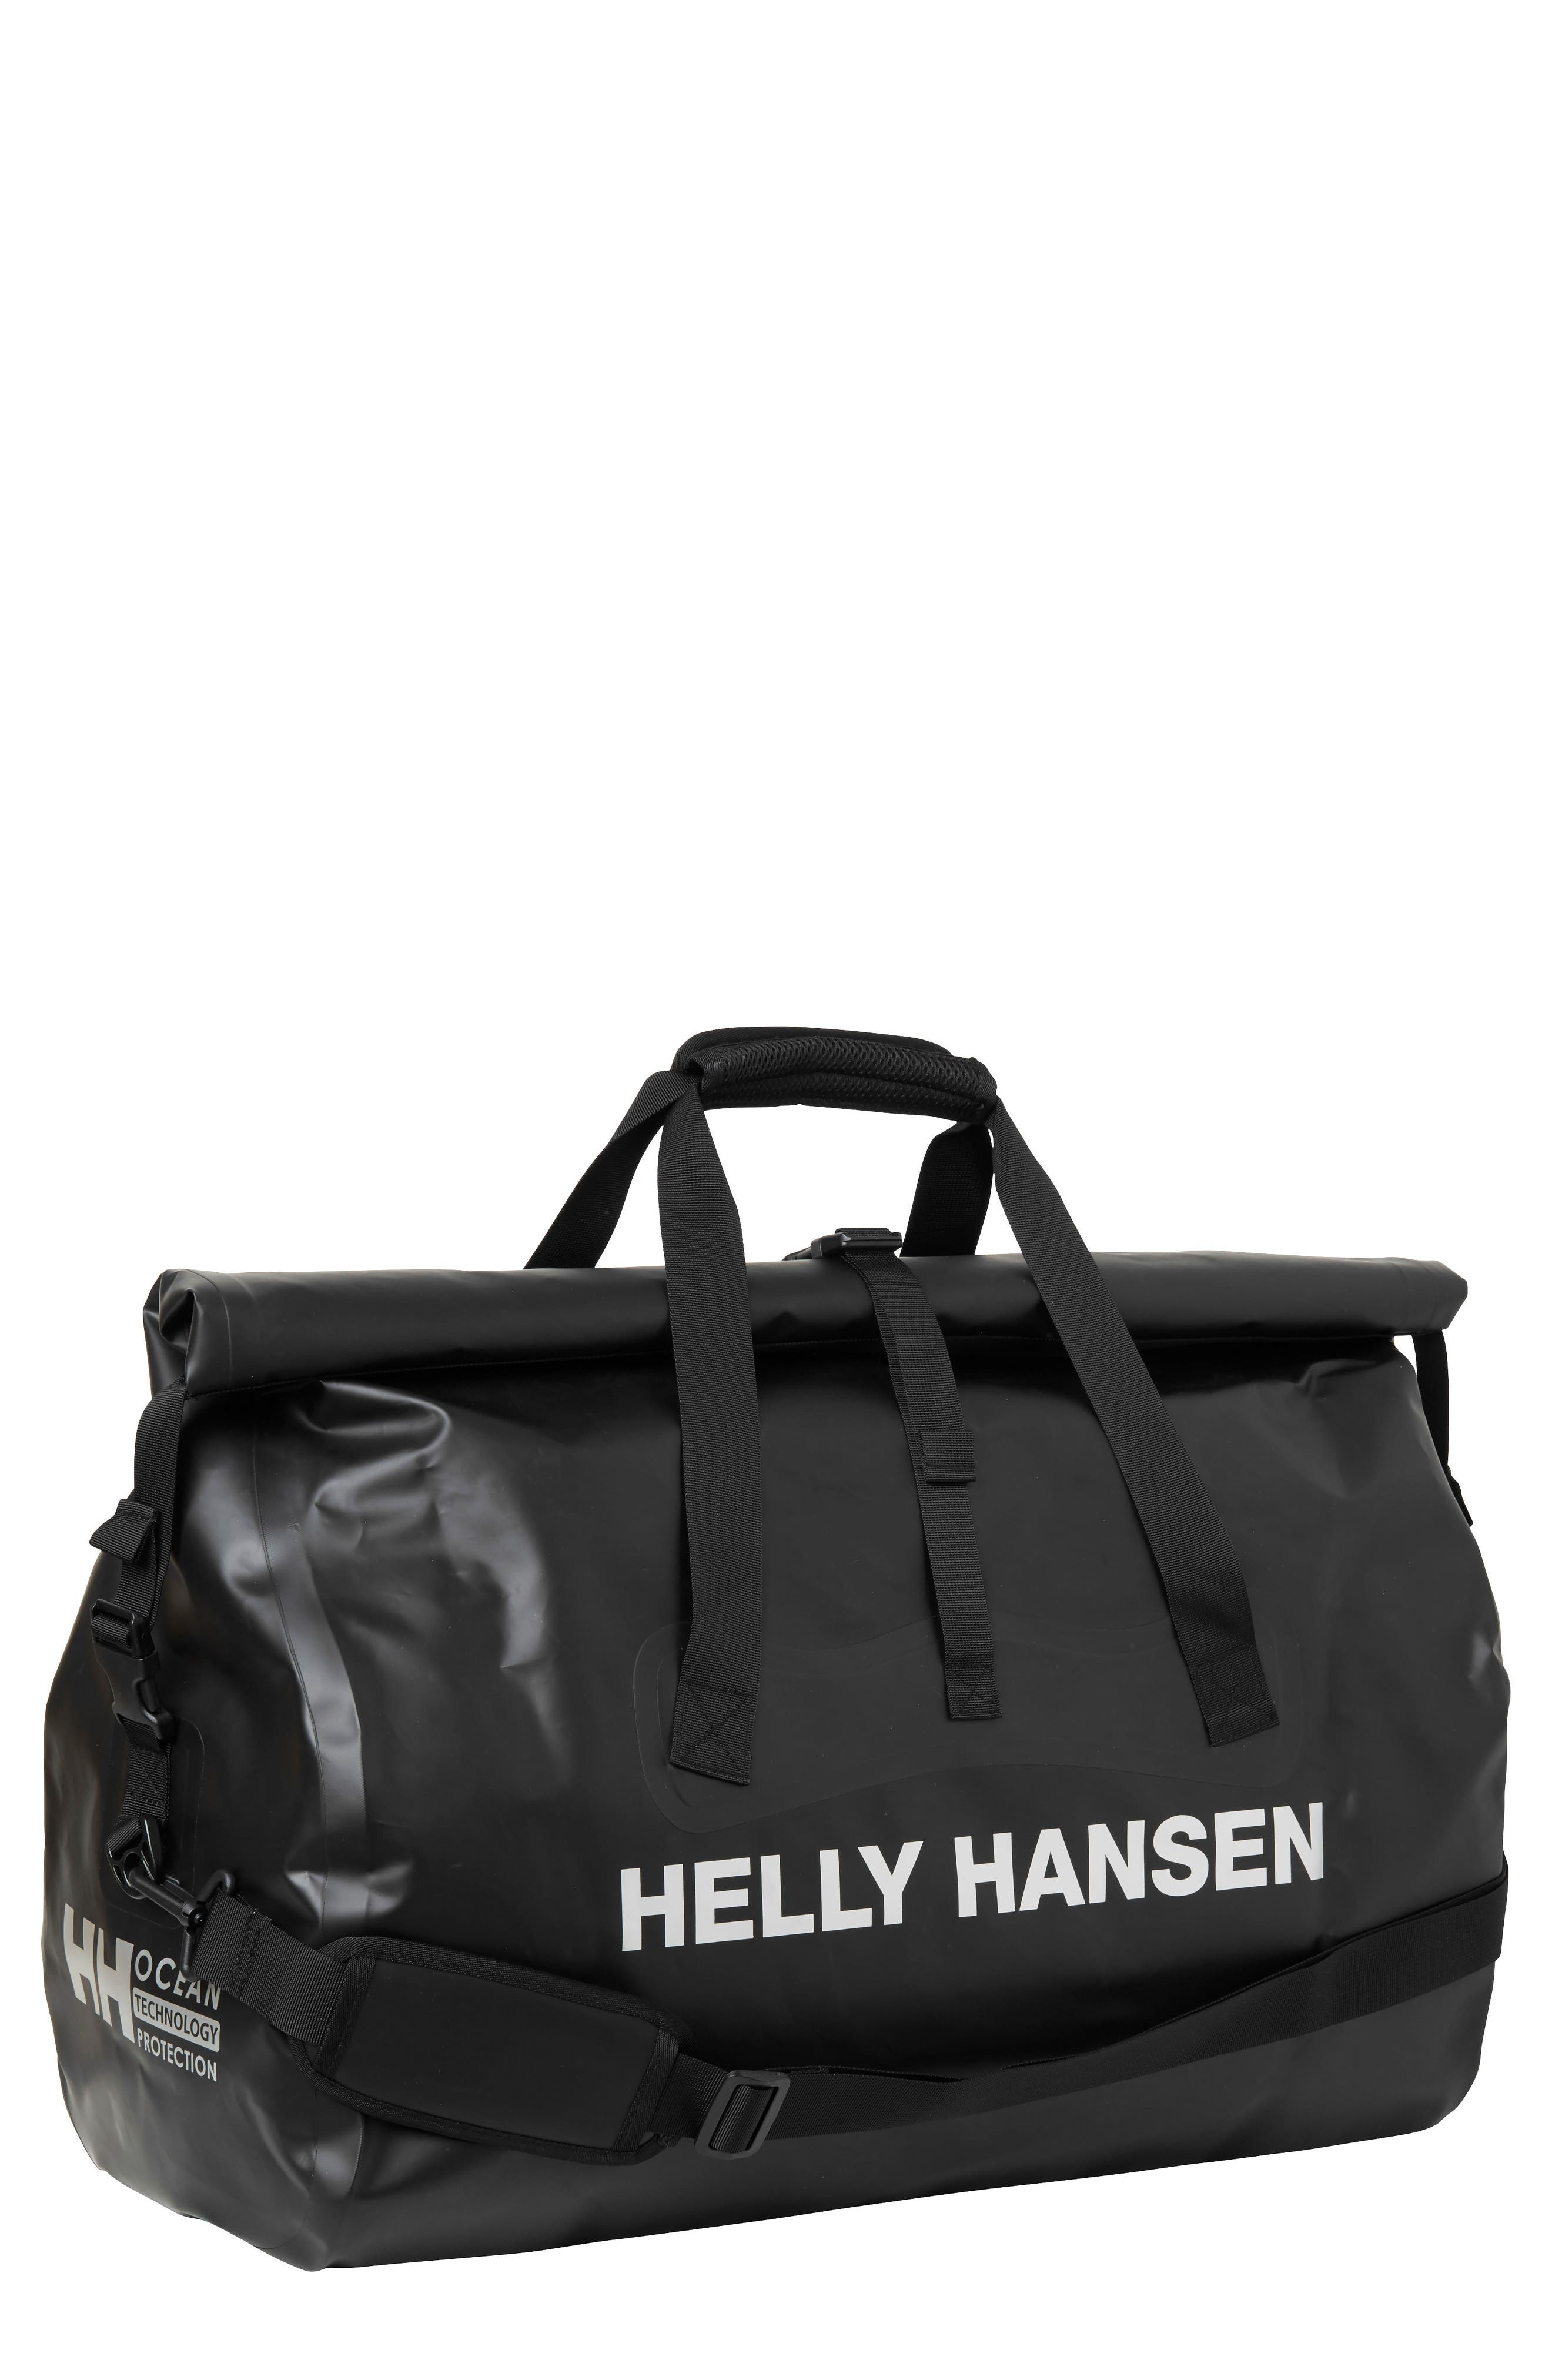 Helly Hansen Sailing Duffel Bag